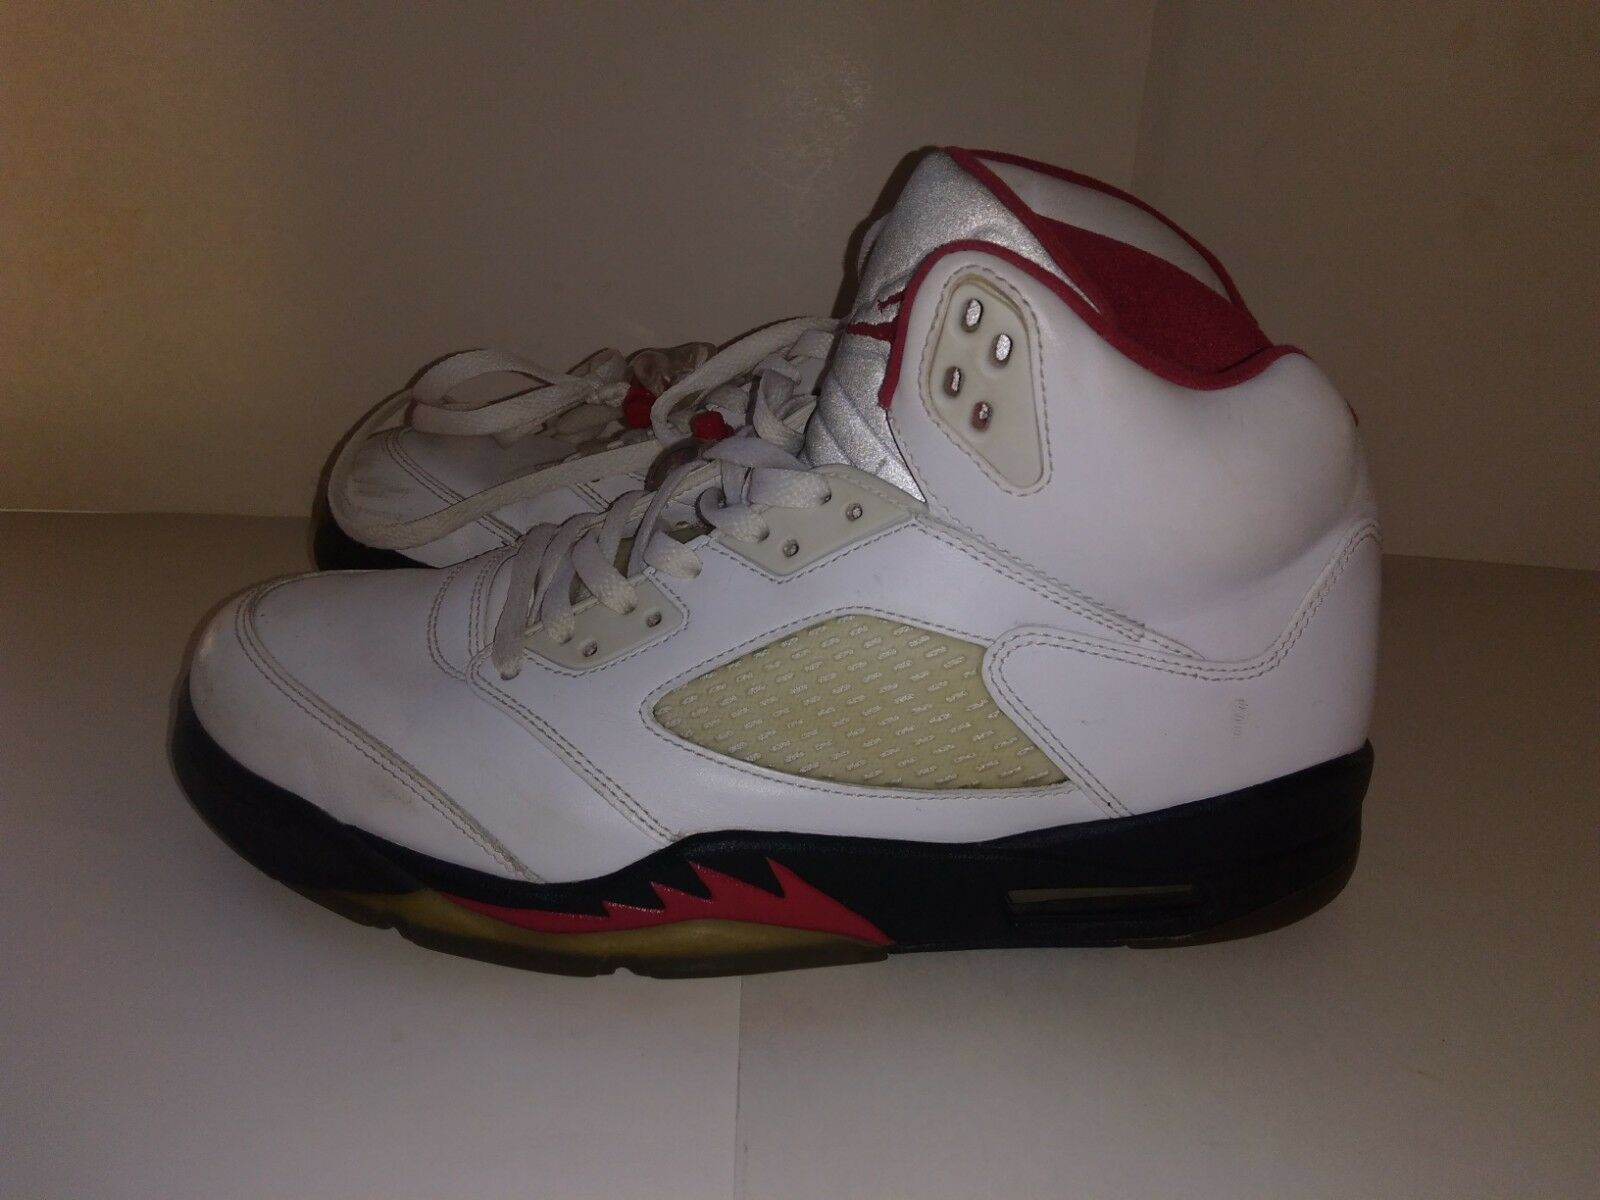 Nike Vintage Air Jordan / Bianco, Rosso Vintage Nike Dimensioni 10,5 64082b